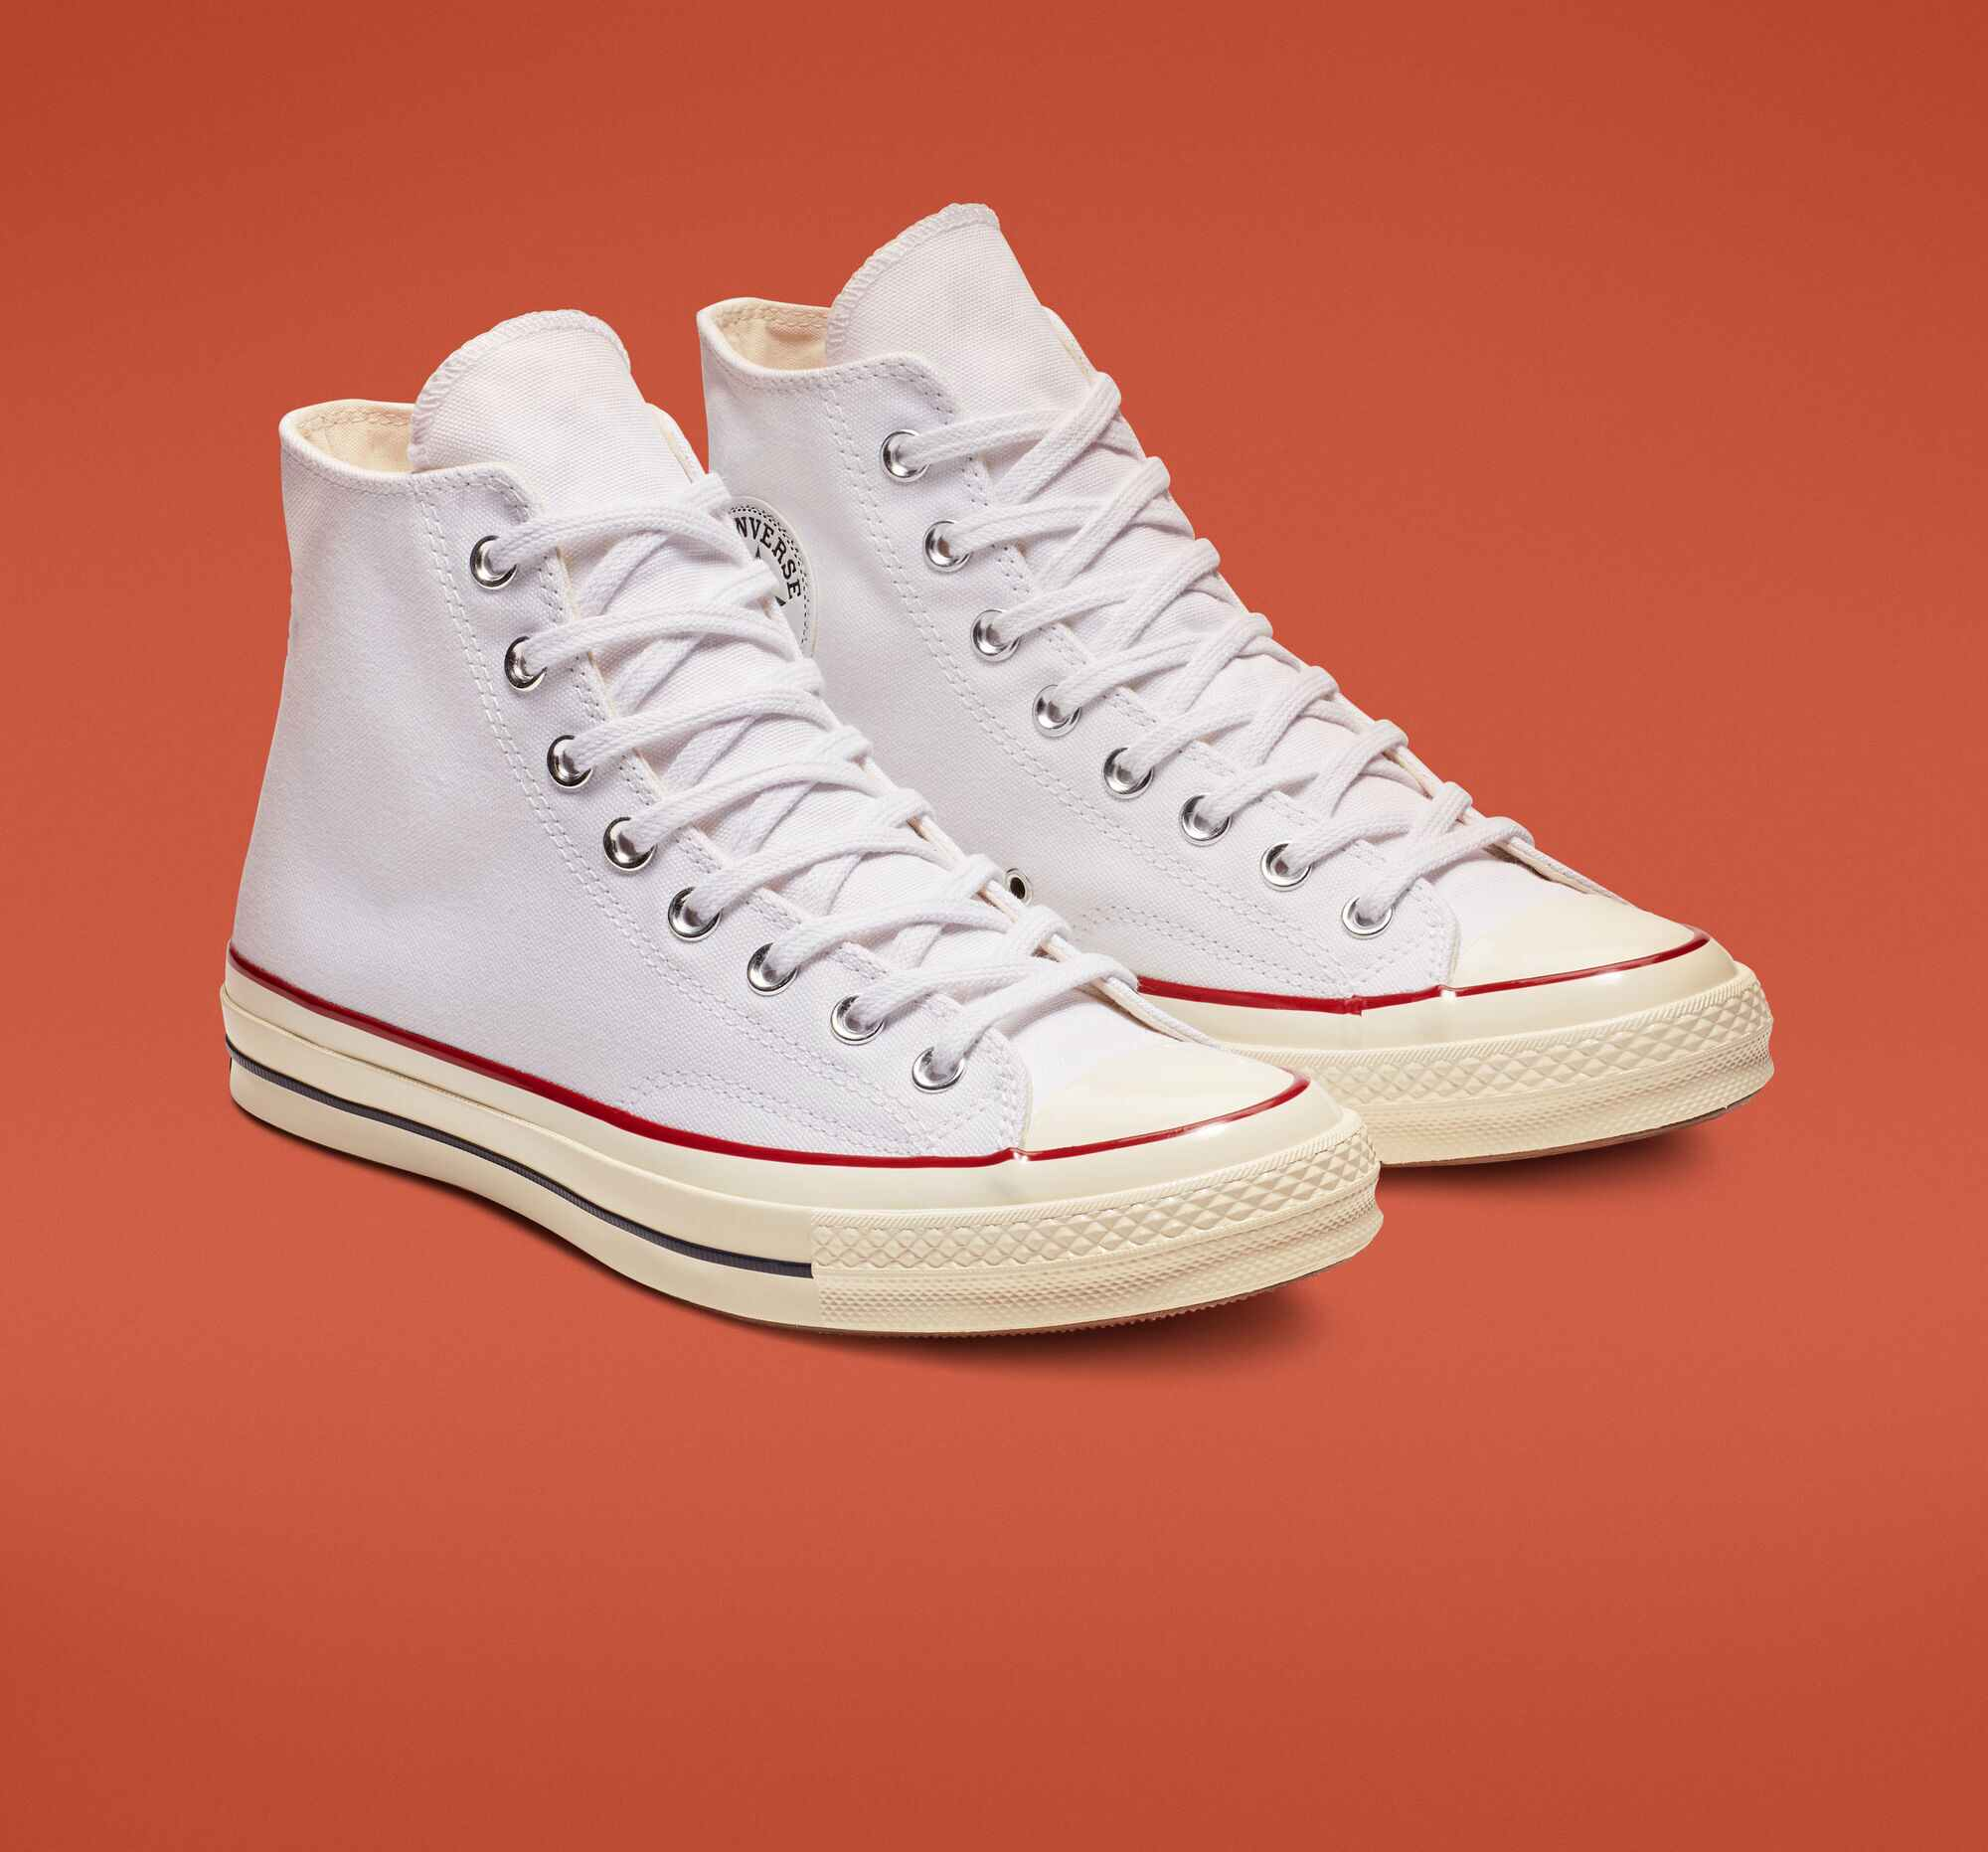 Converse Chuck 70 High Top Converse Unisex Shoe